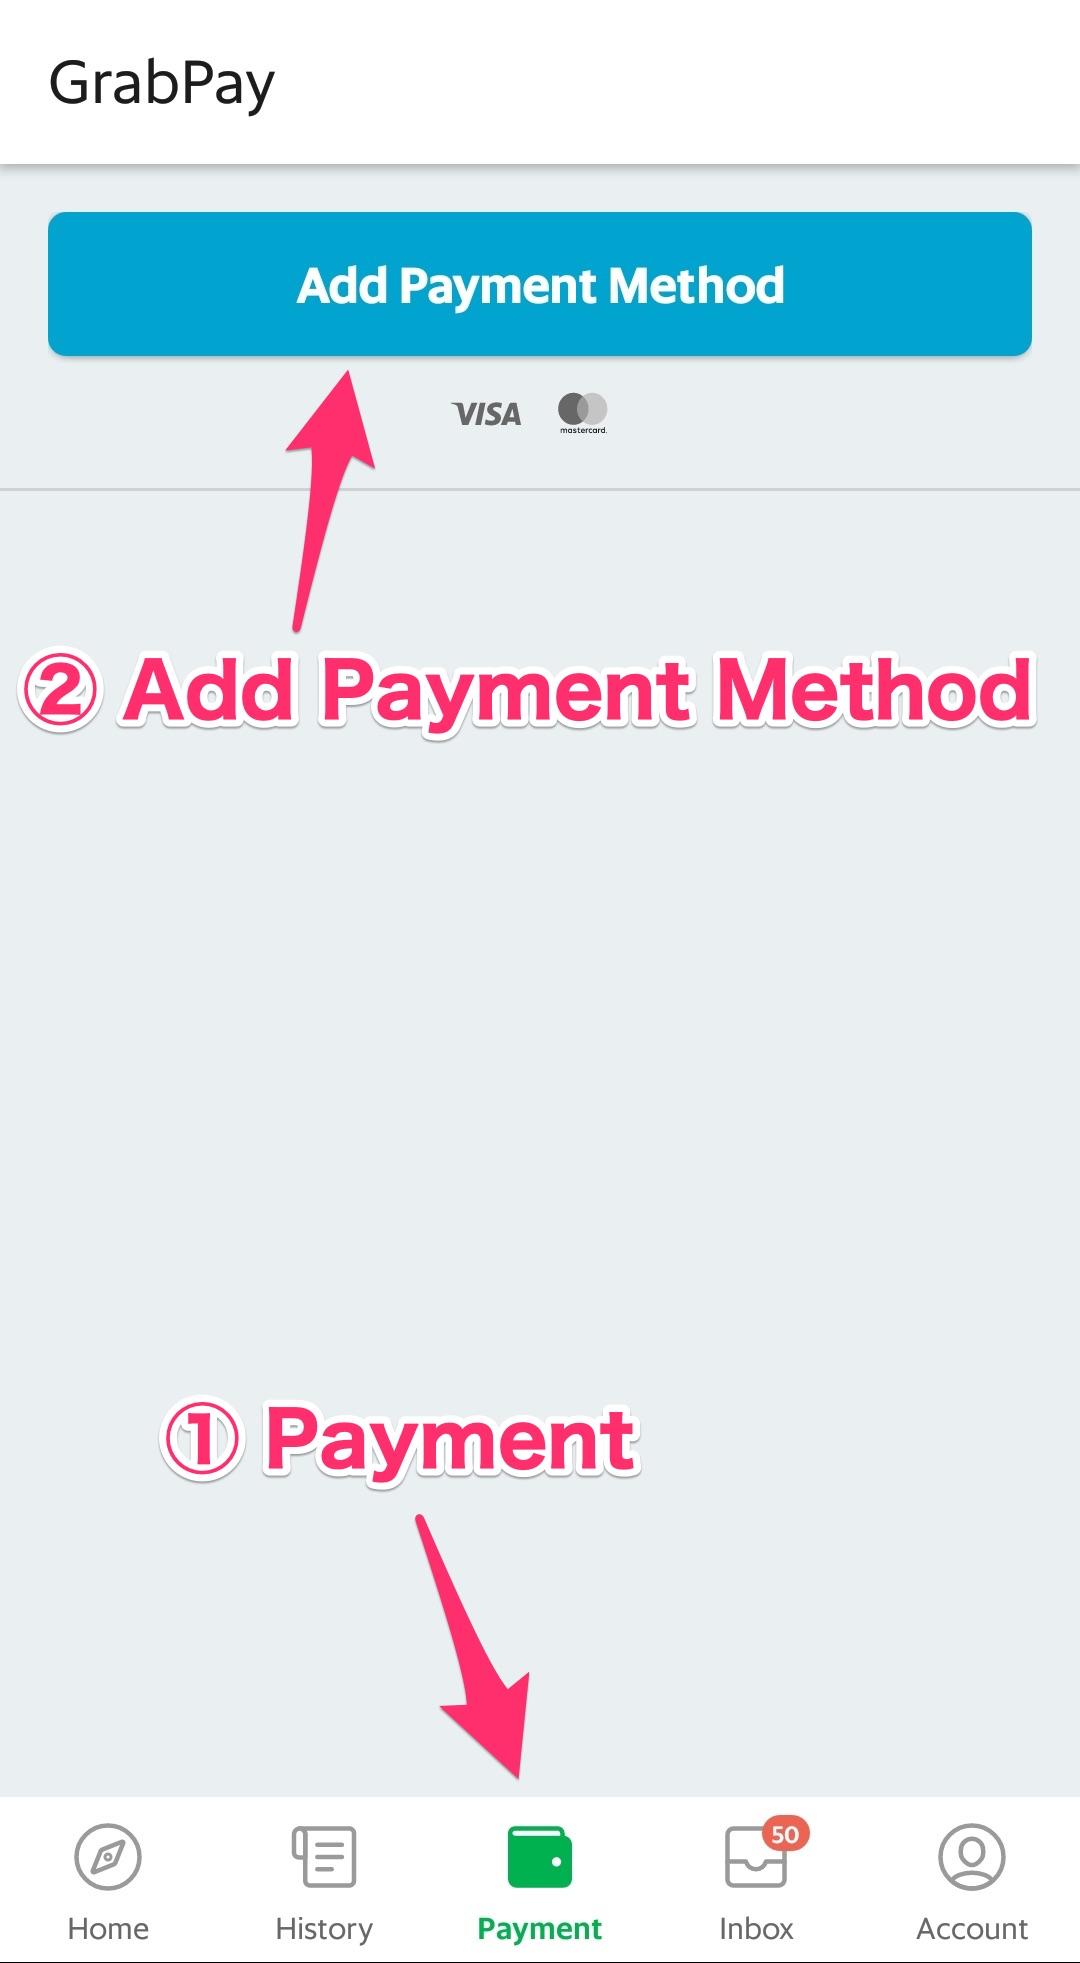 「Payment」から「Add Payment Method」をタップ